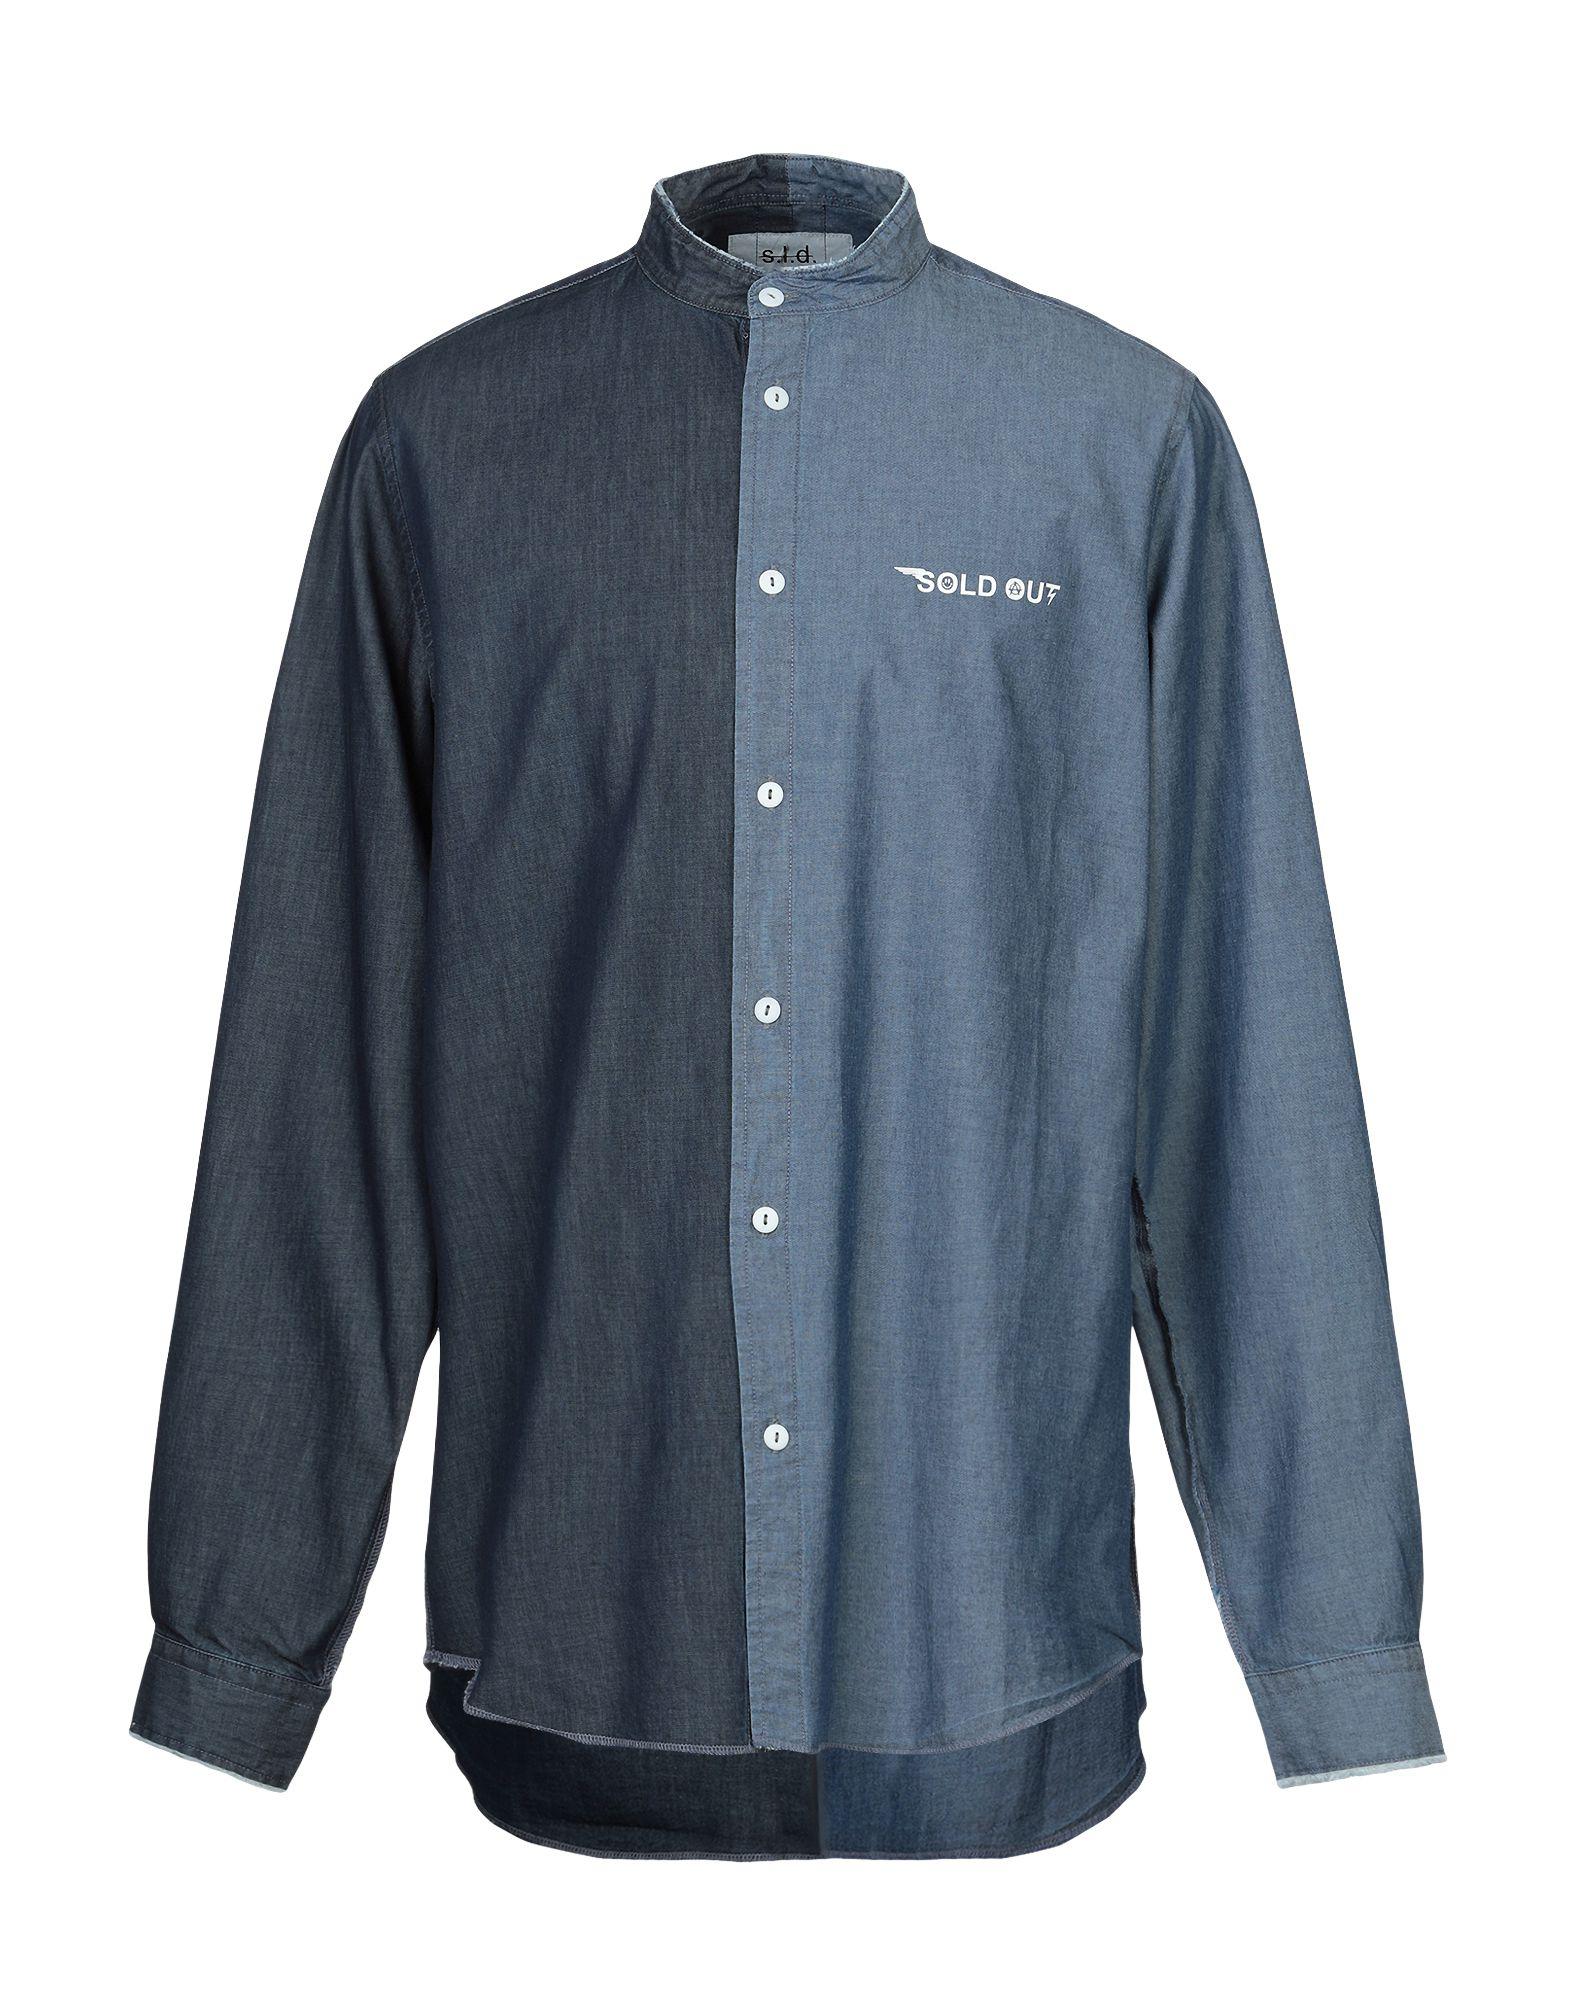 SOLD OUT Джинсовая рубашка sold